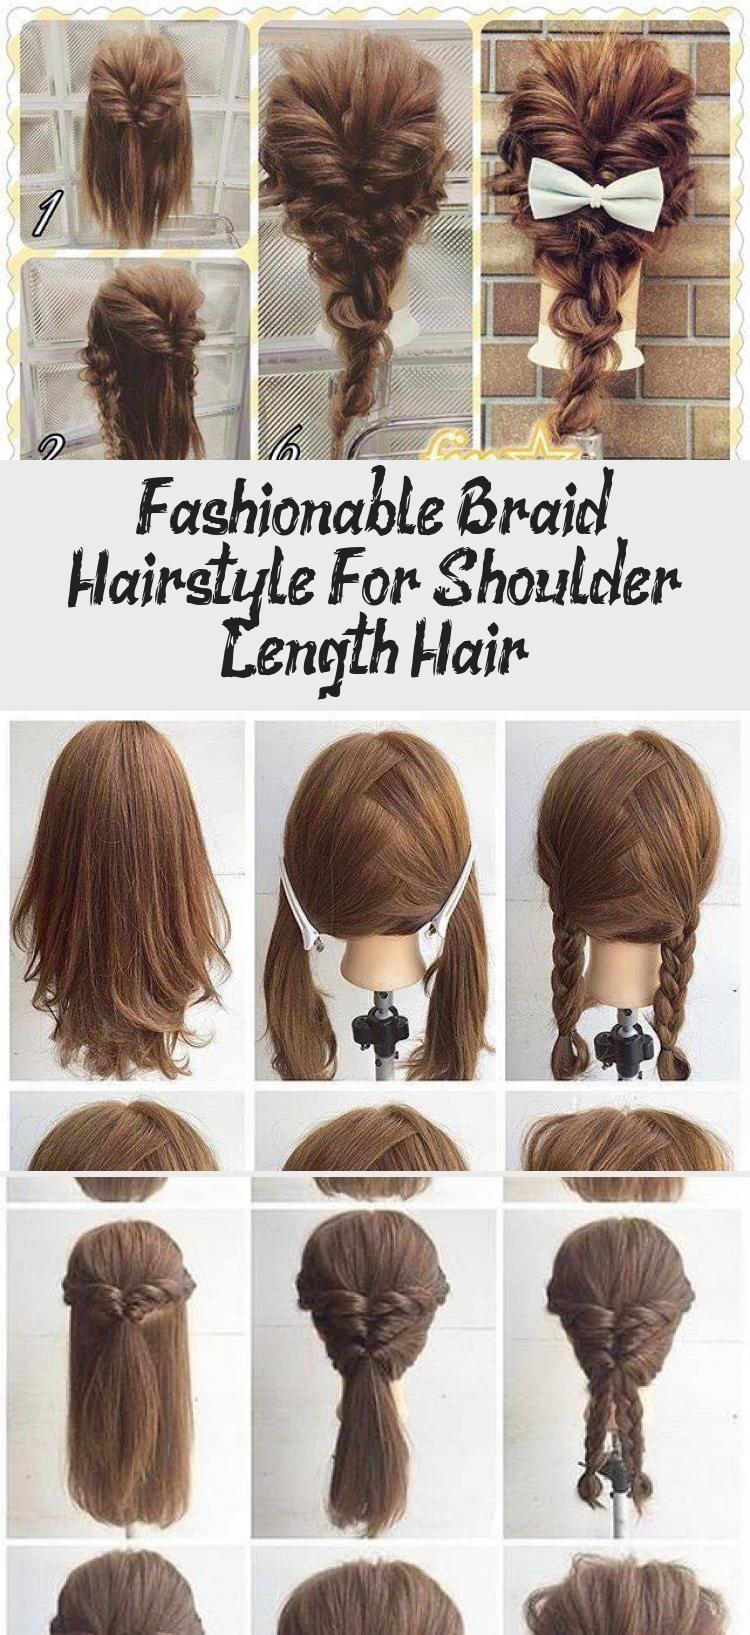 Fashionable Braid Hairstyle For Shoulder Length Hair Hairtutorialshoulderlength Bohemian Style Bohemian Braid Fashionable Hair Hairstyle Hairtutorial 2020